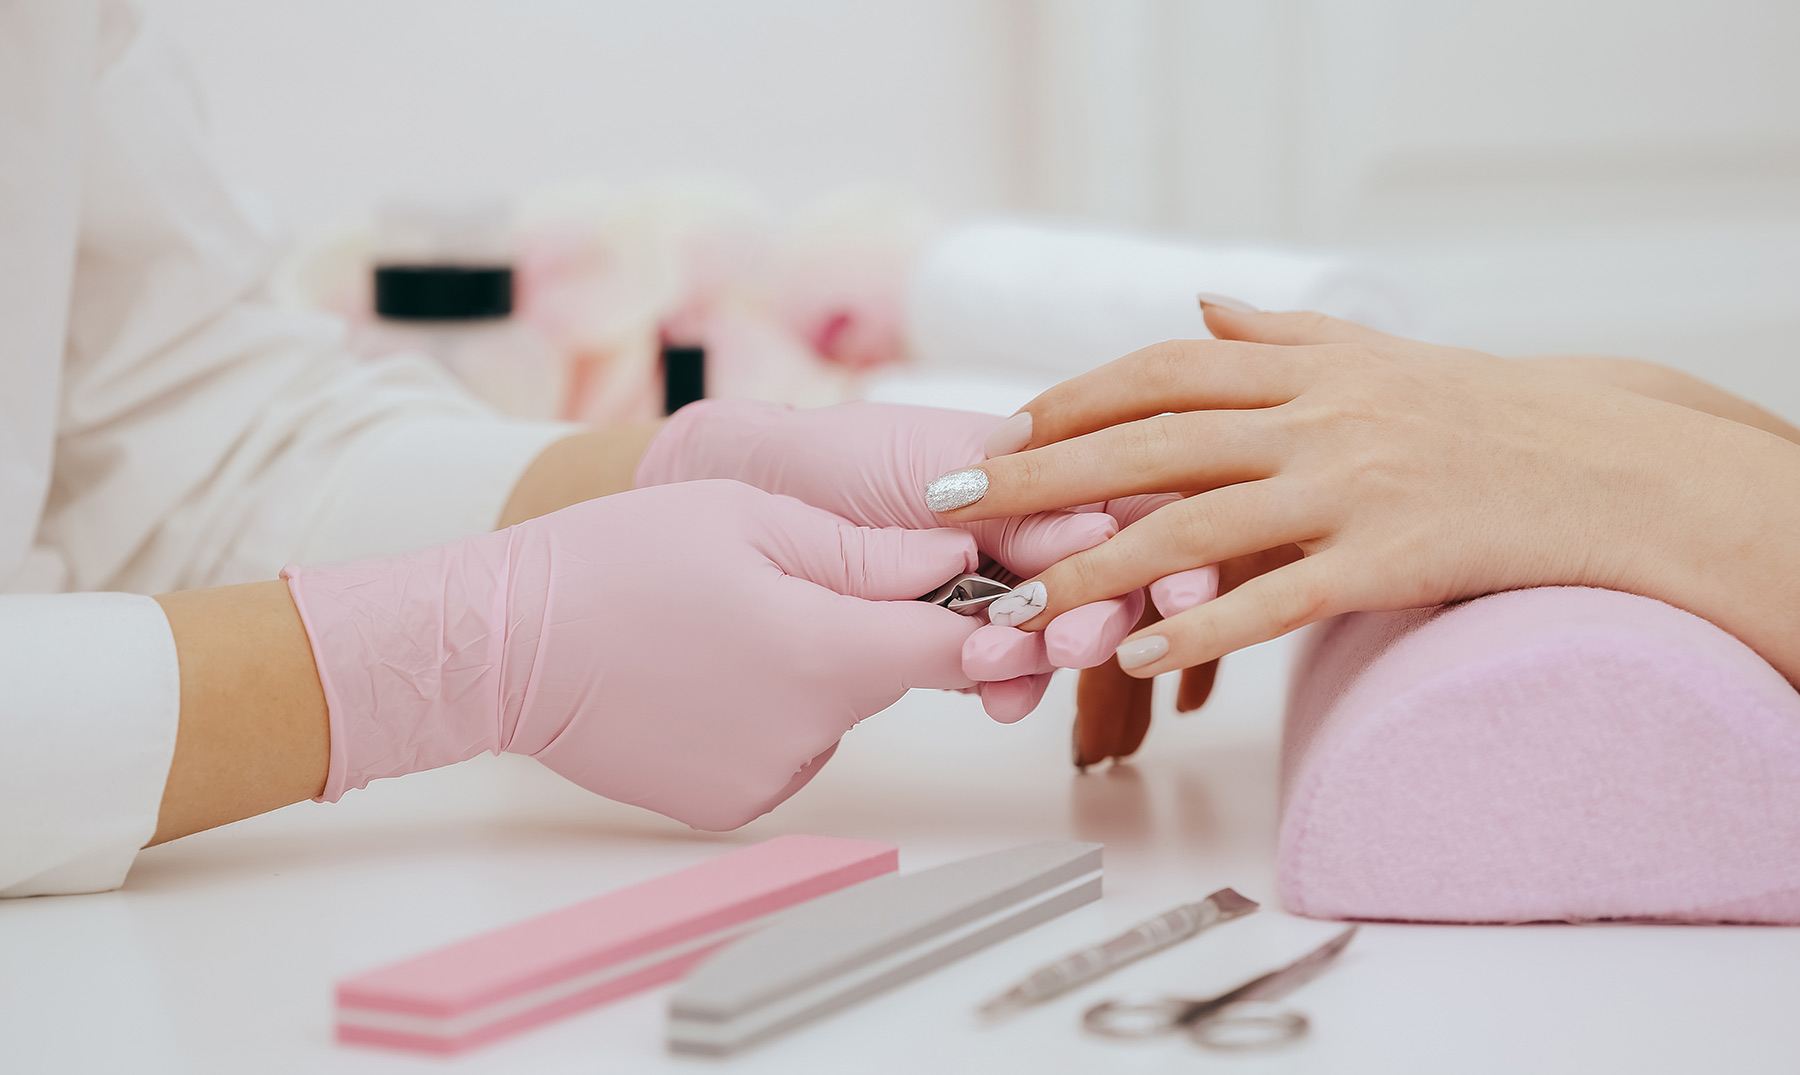 Servicios de manicure a domicilio